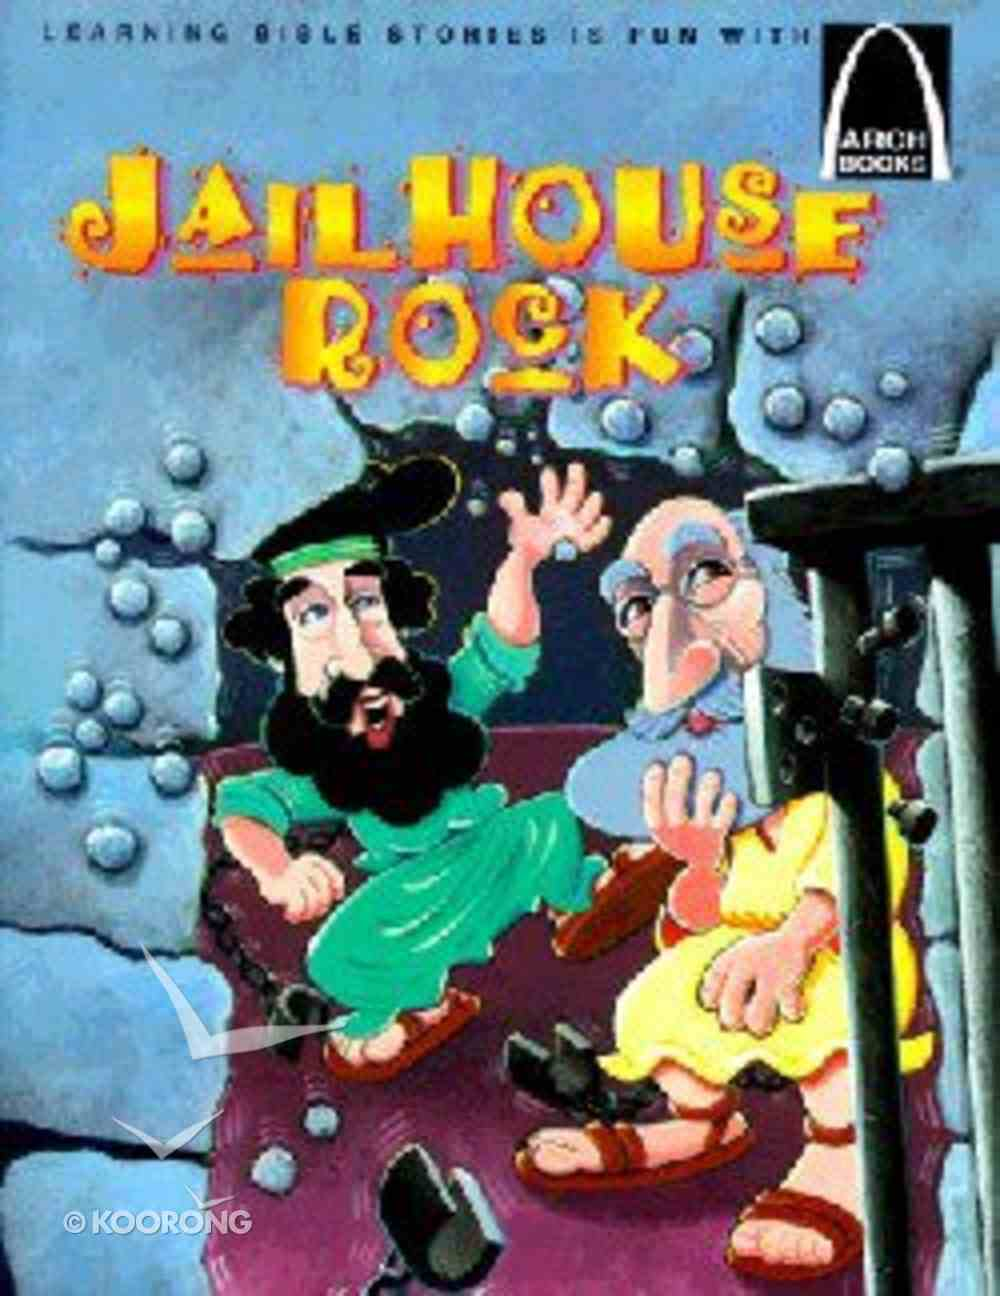 Jailhouse Rock (Arch Books Series) Paperback